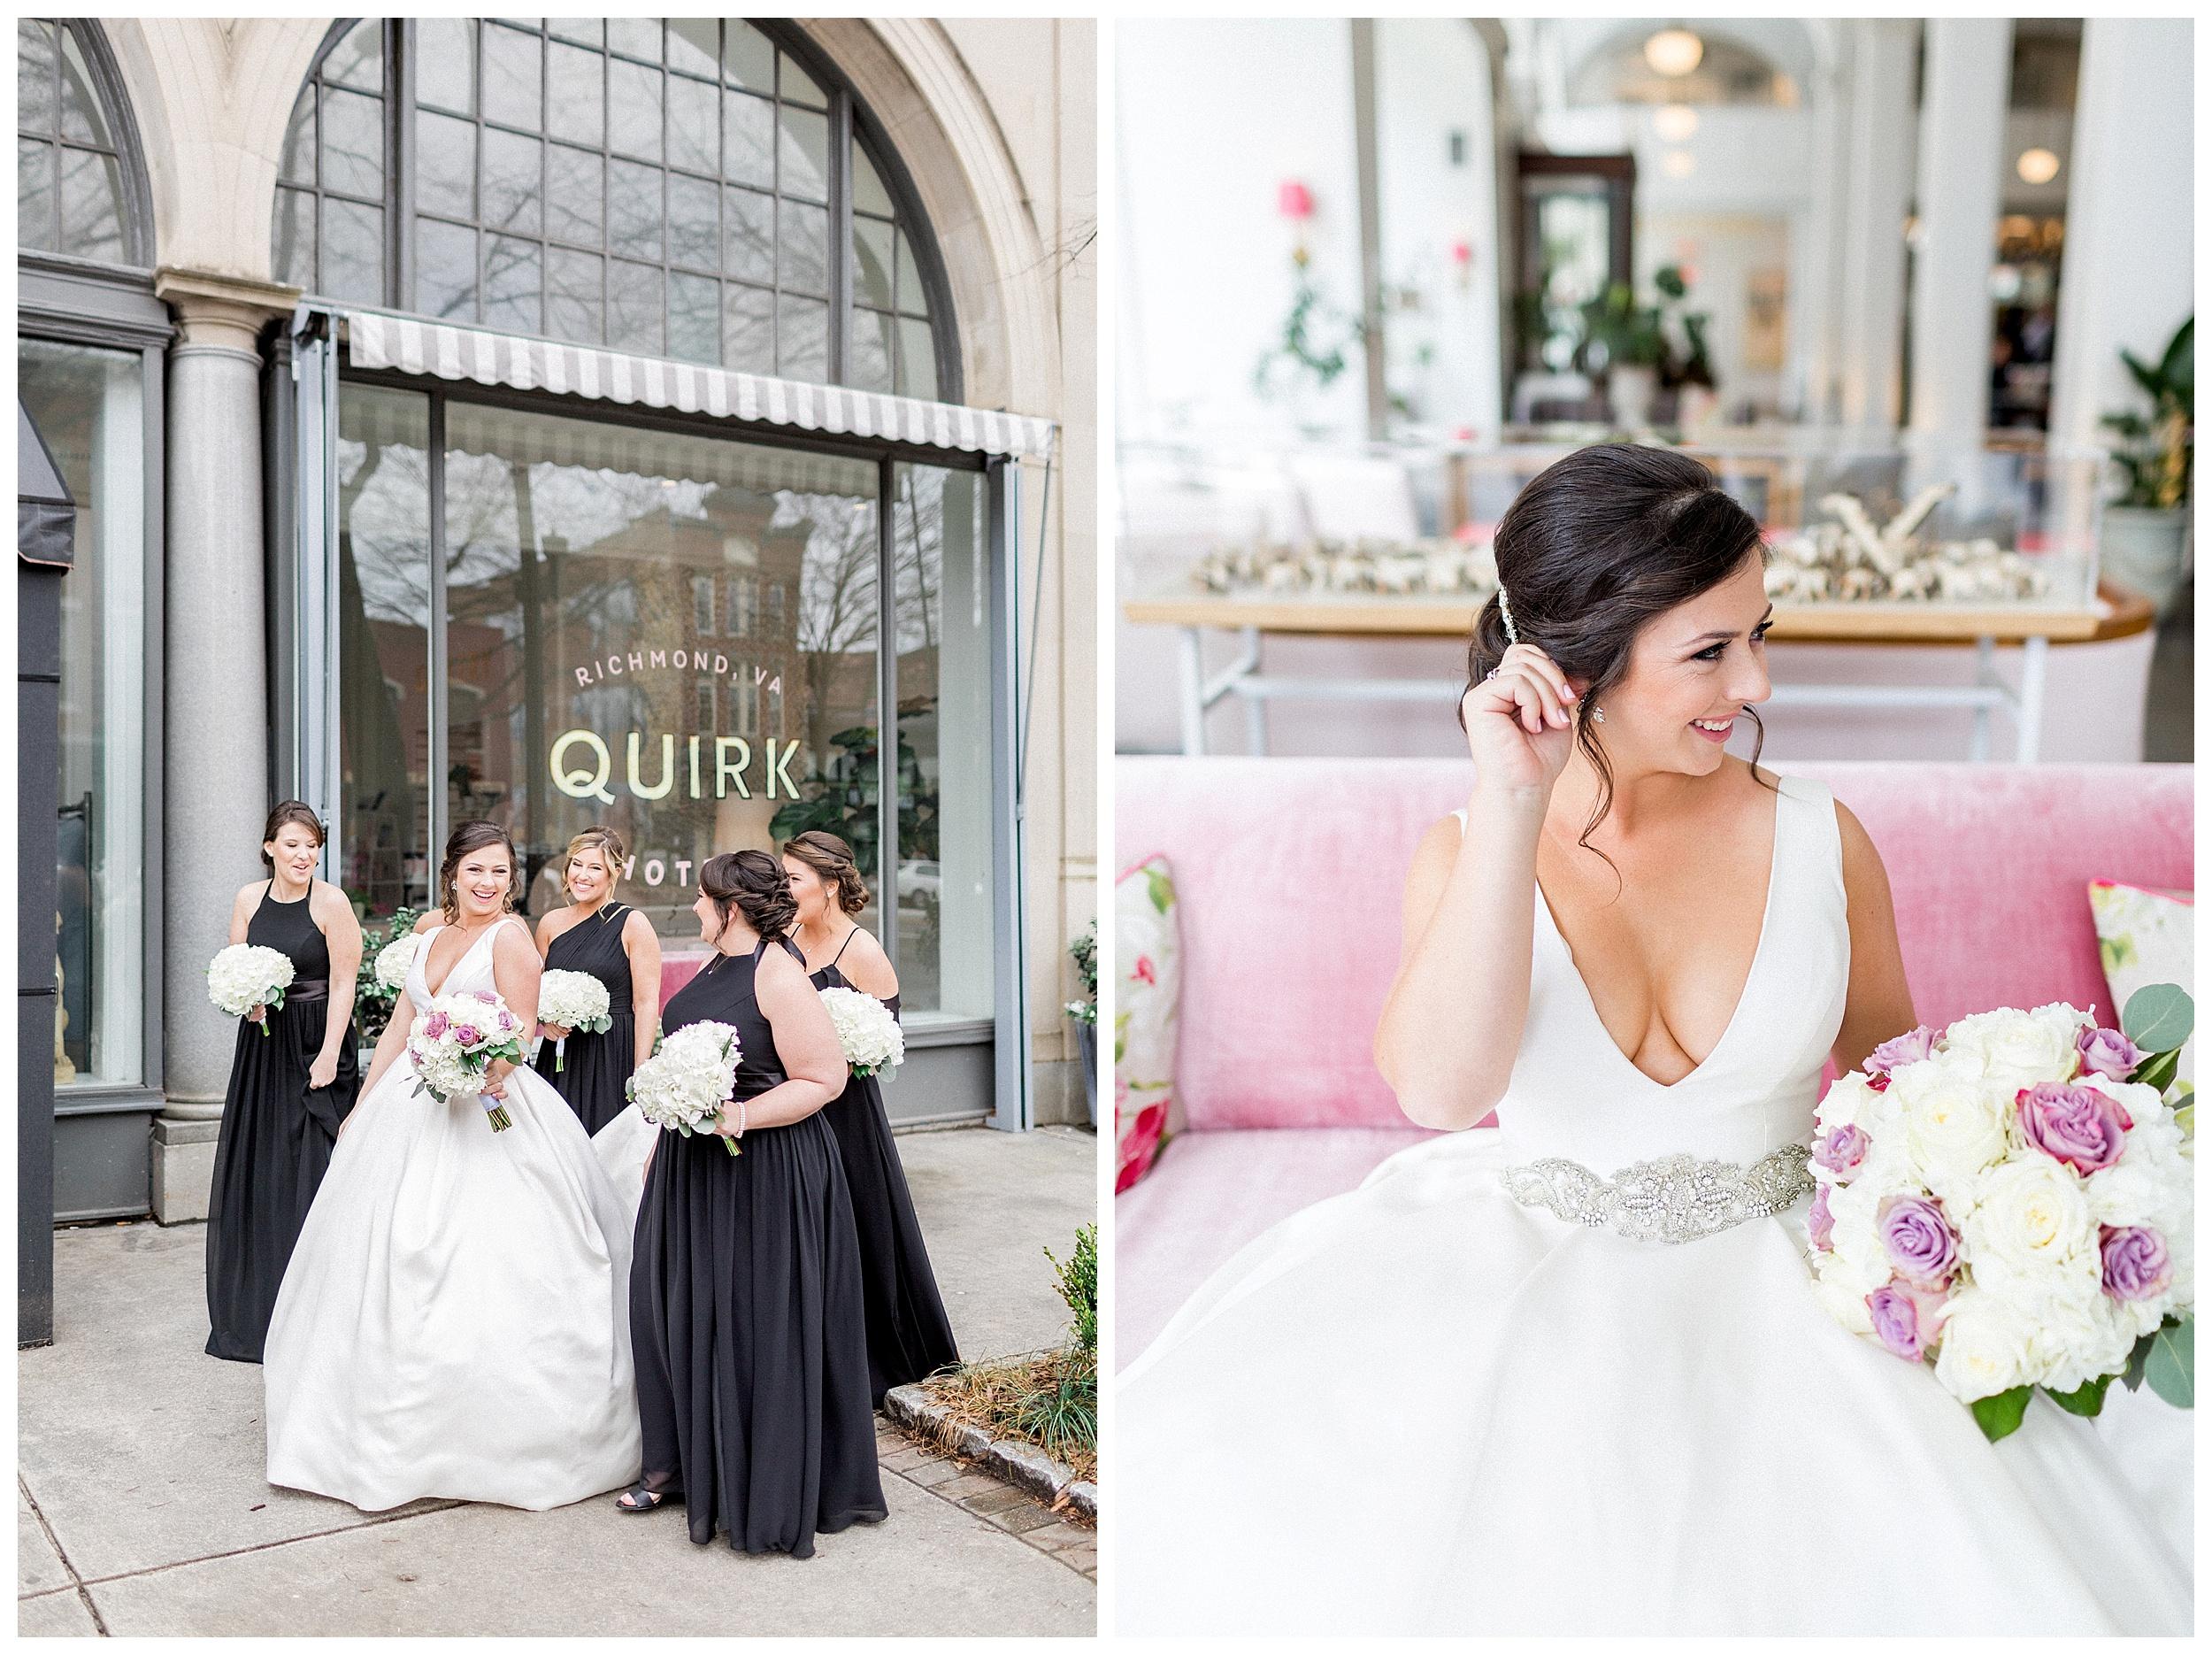 Country Club of Virginia Wedding | Richmond Wedding Photographer_0058.jpg